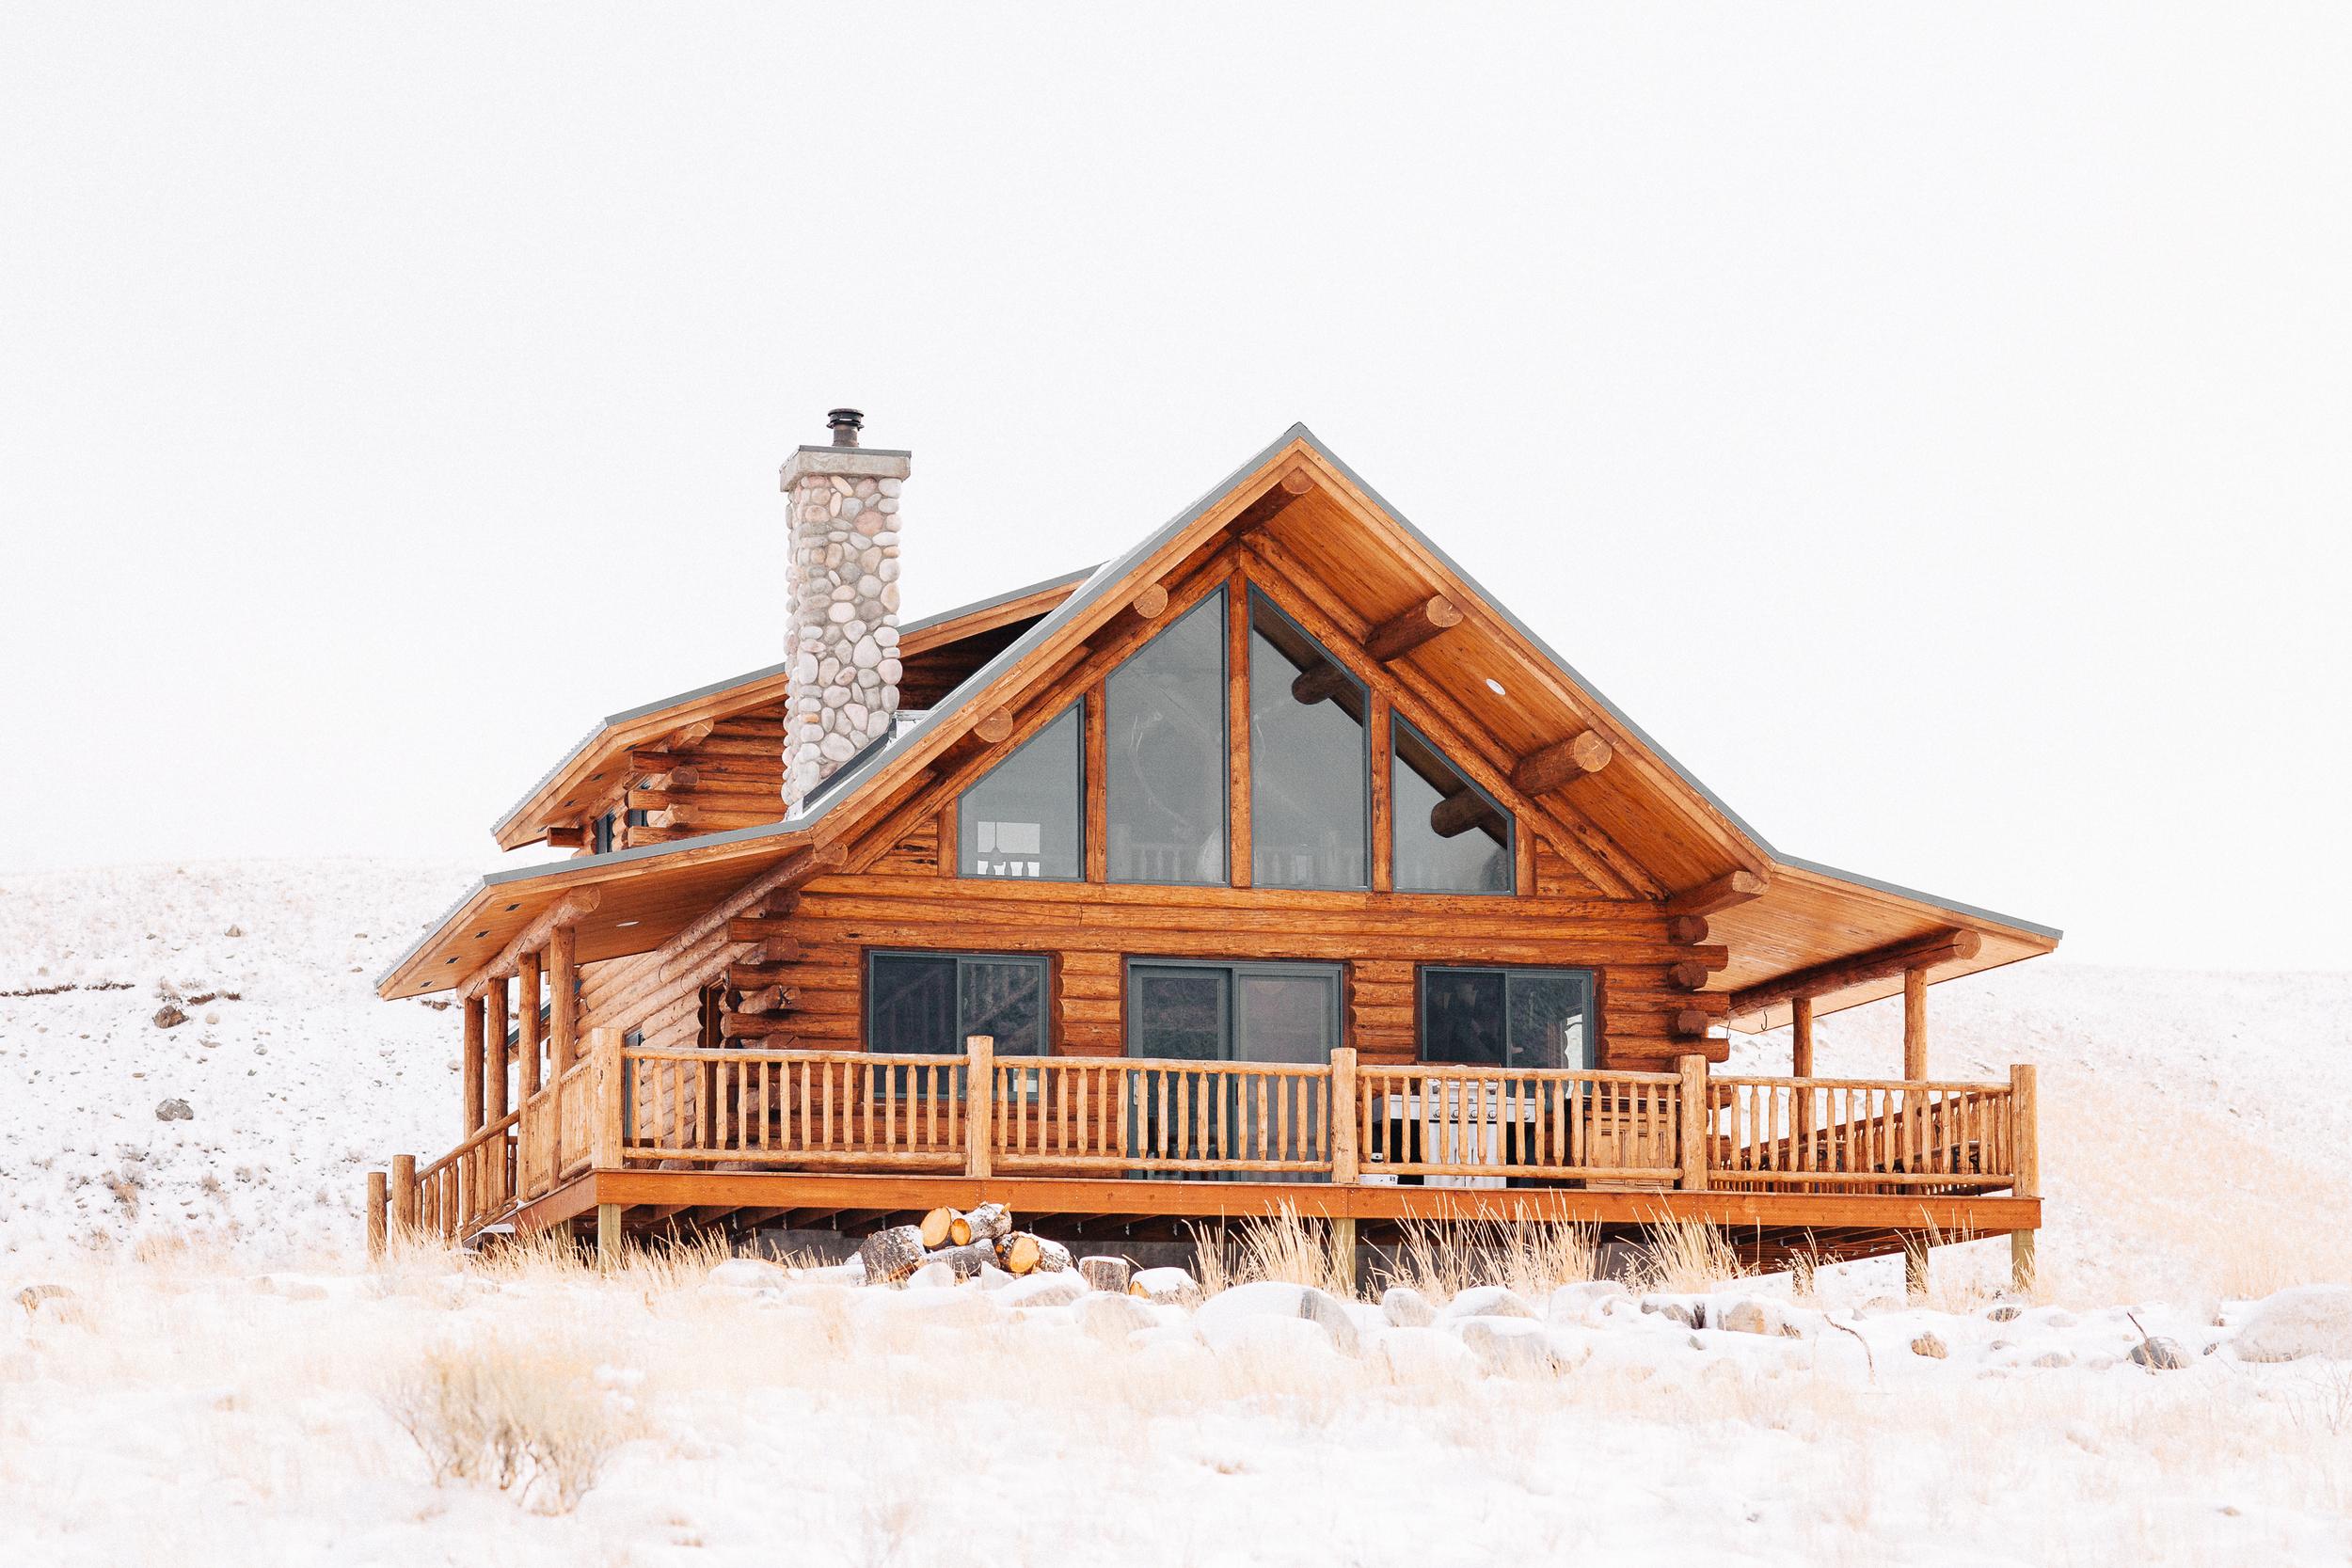 The Montana cabin.